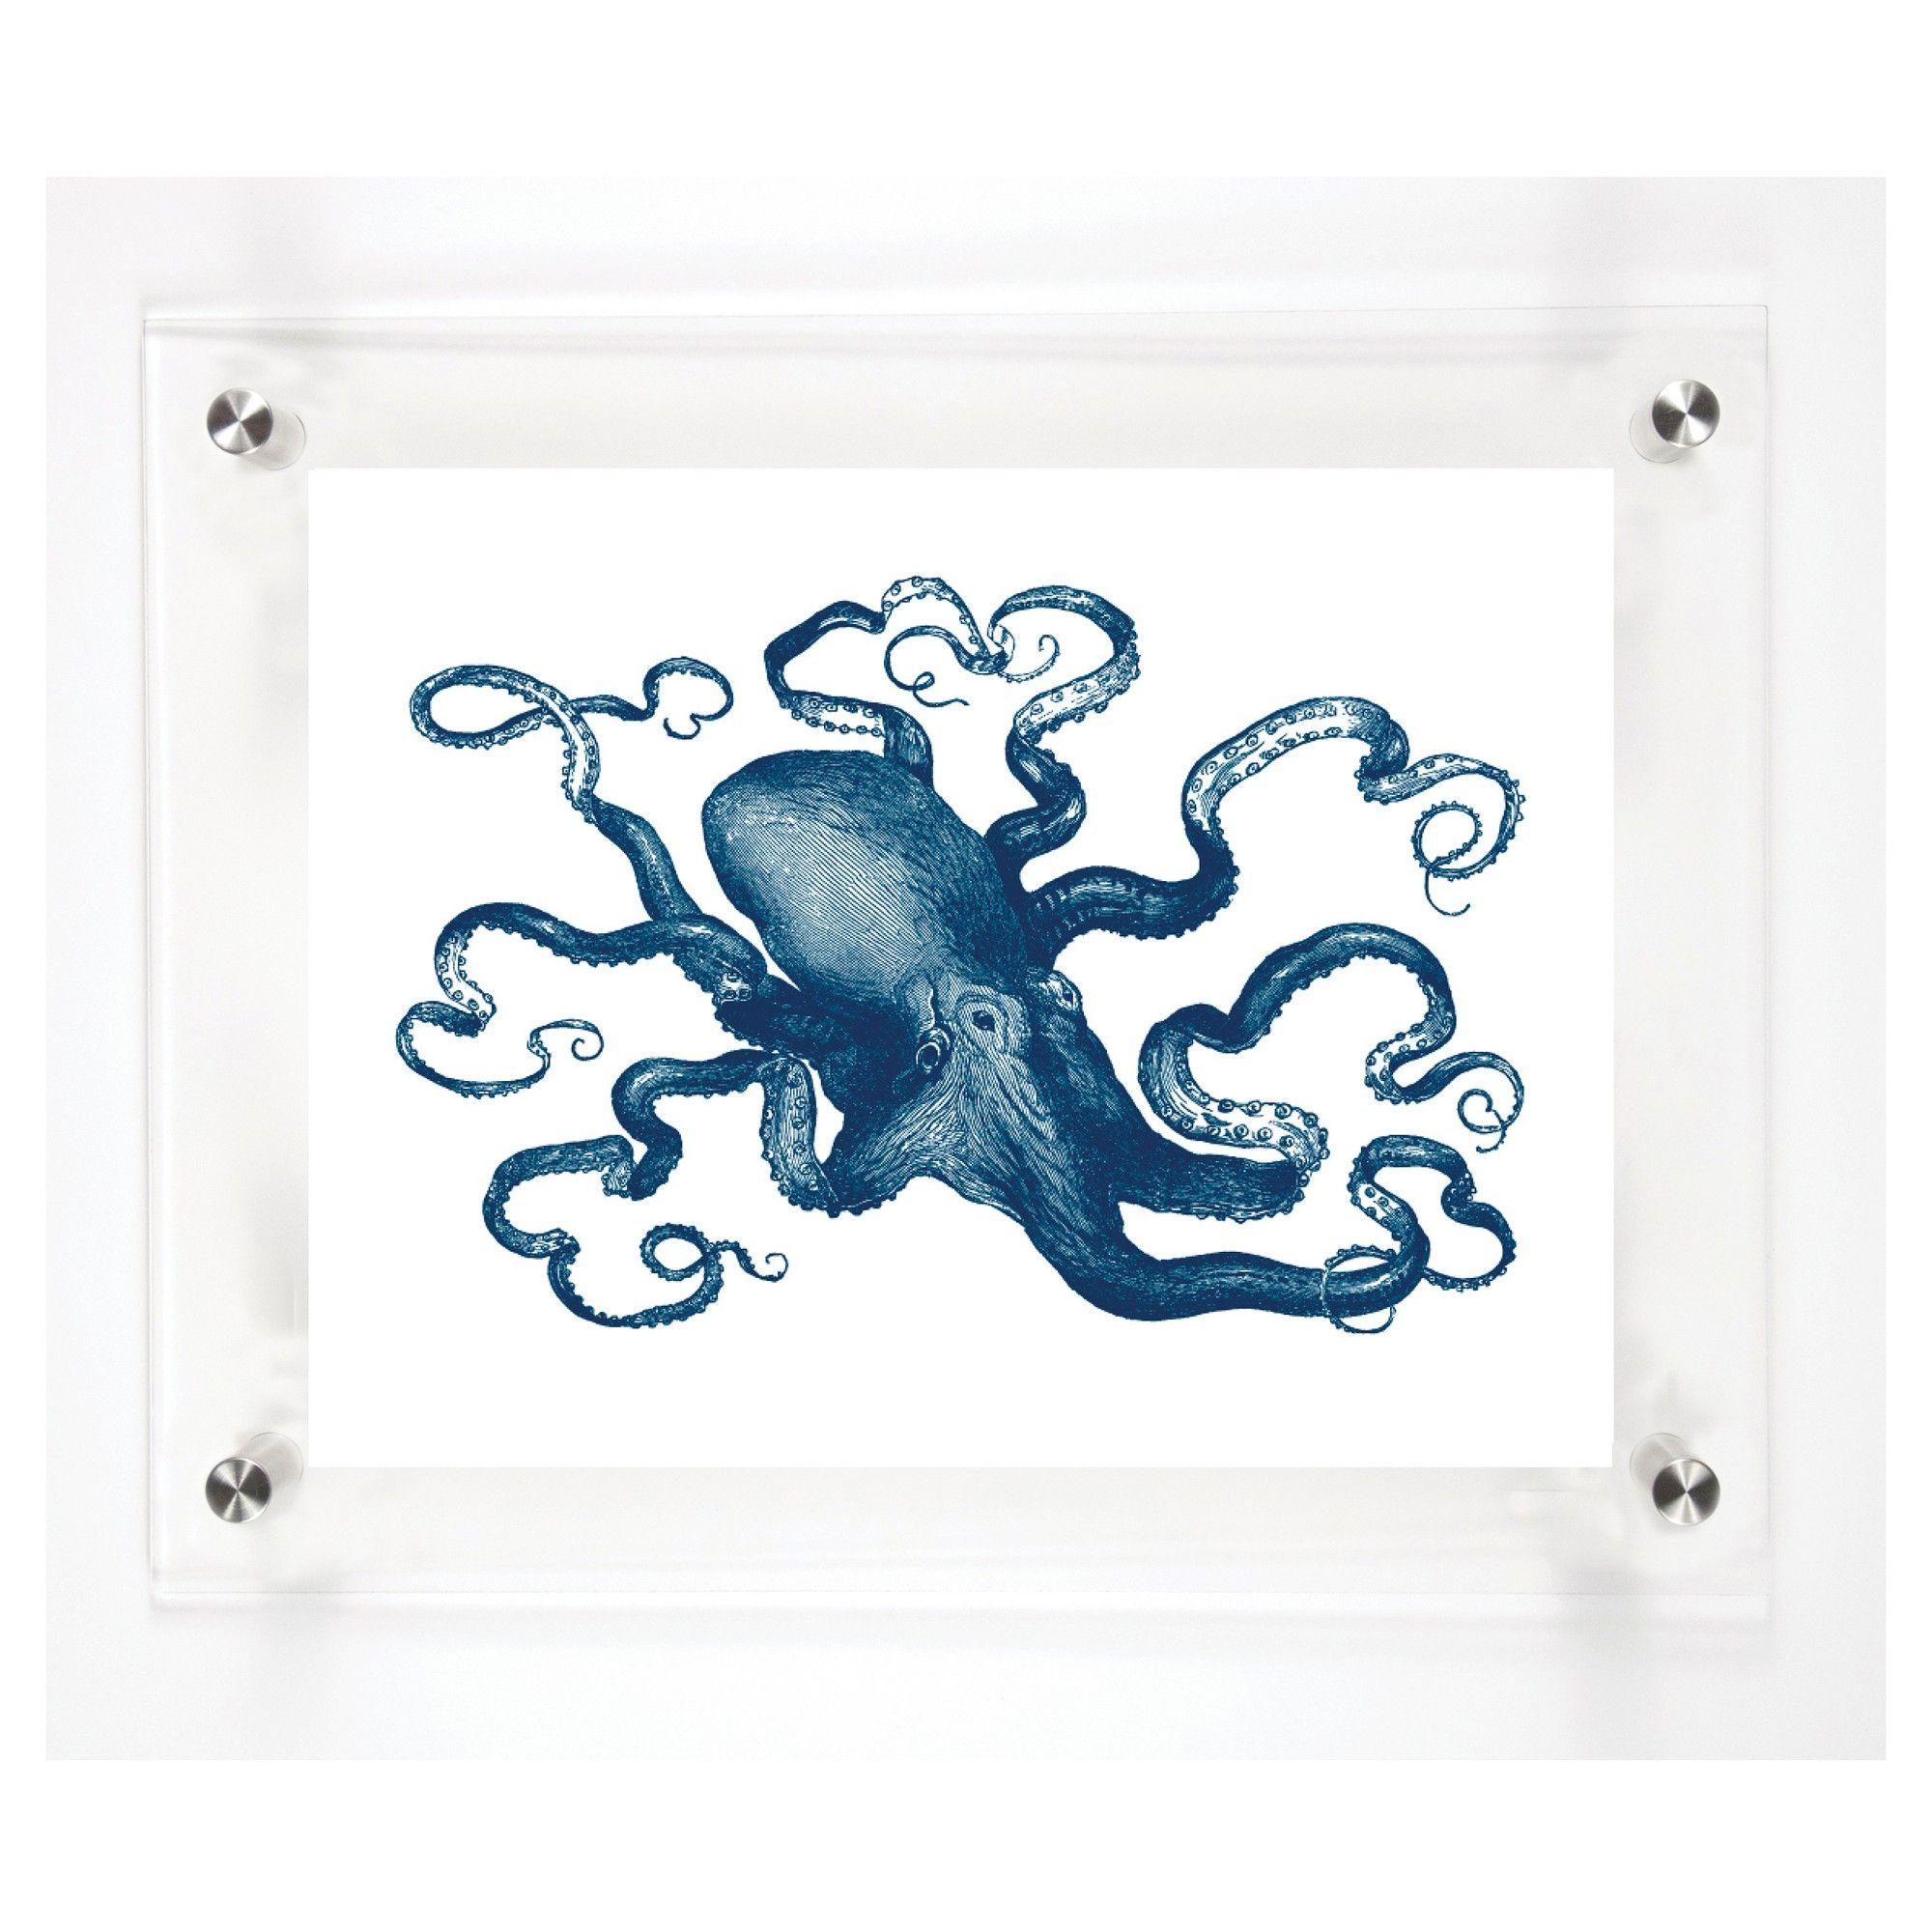 Mitchell black octopus decorative framed wall canvas midnight